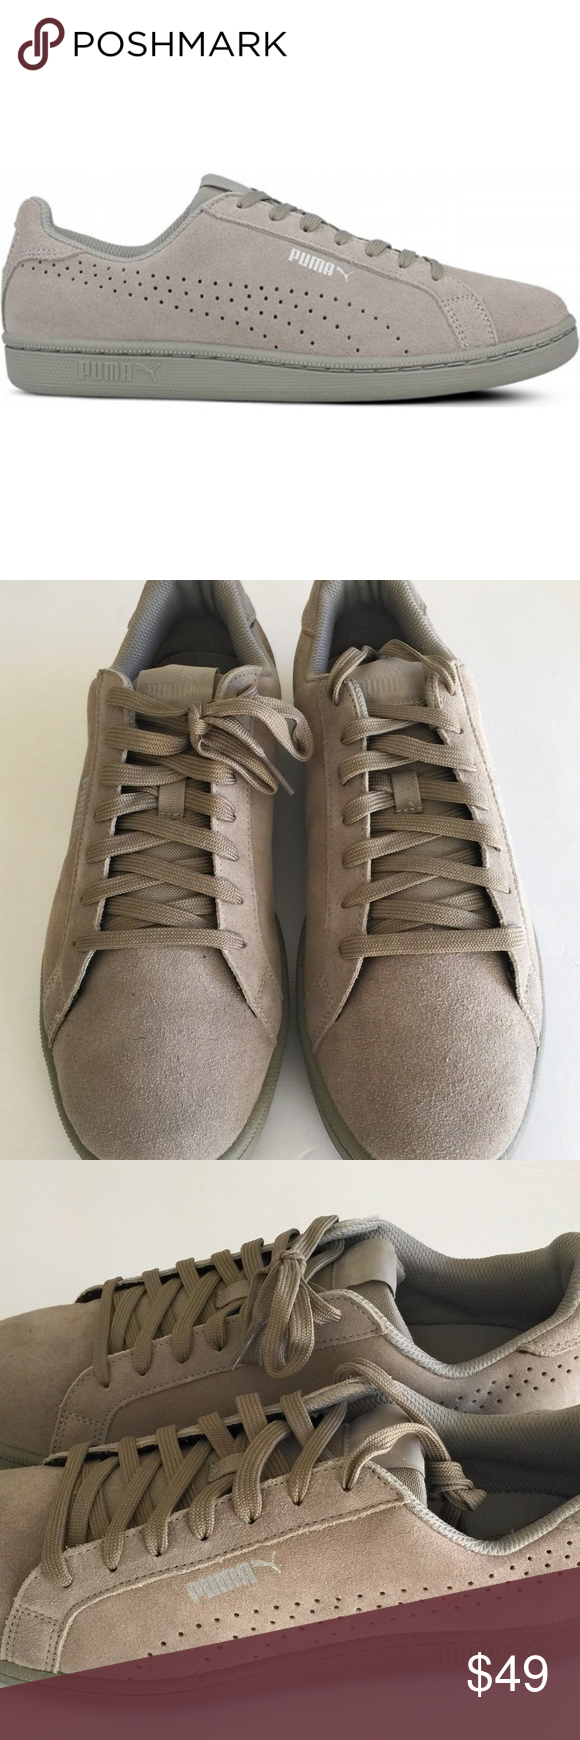 1a86603fe16 puma smash perf sd rock ridge puma smash perf sd rock ridge Puma Shoes  Sneakers